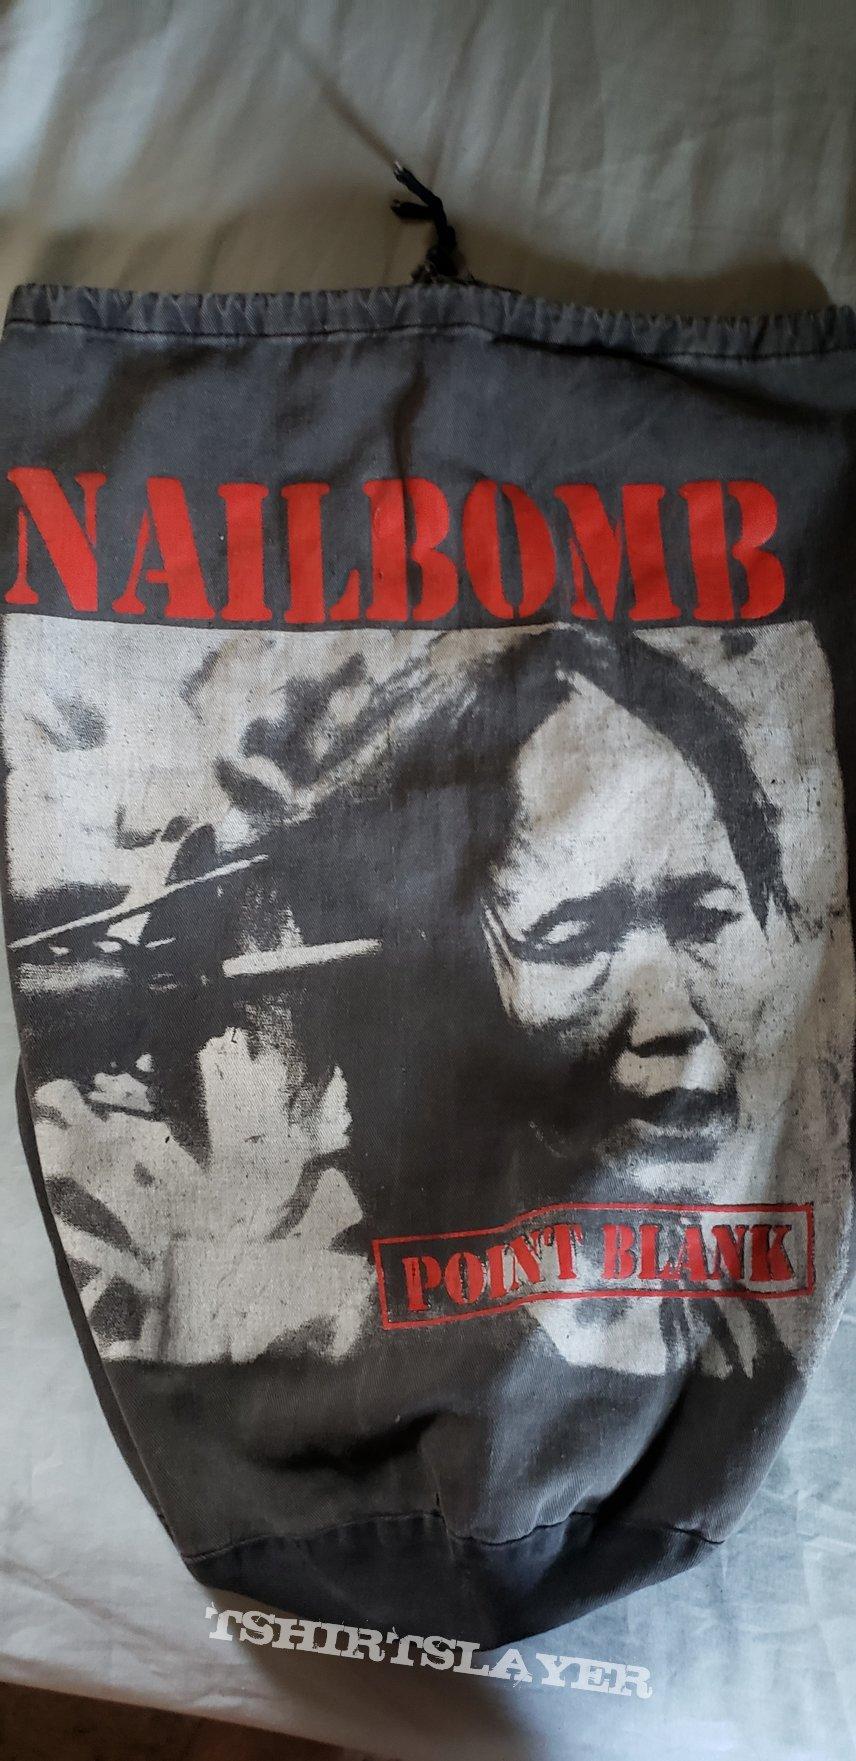 Nailbomb - Point Blank Bag